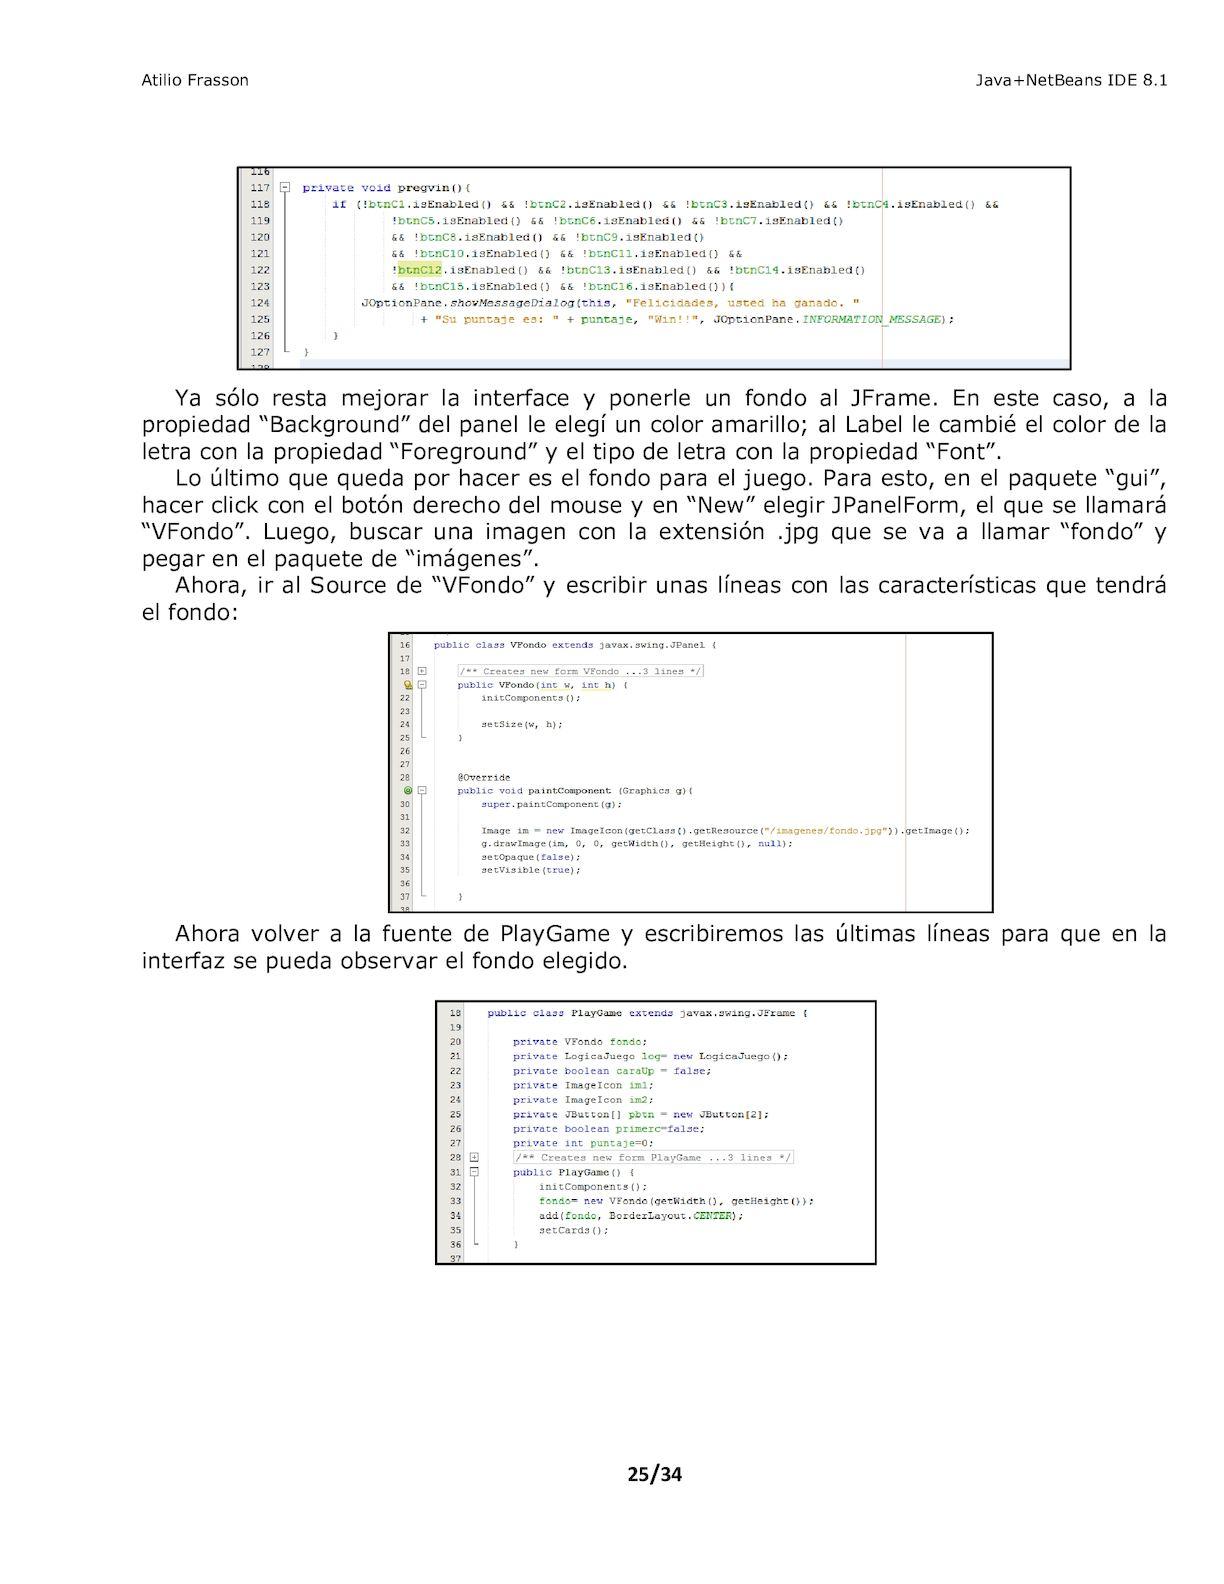 Java + NetBeans IDE 8 1 - CALAMEO Downloader